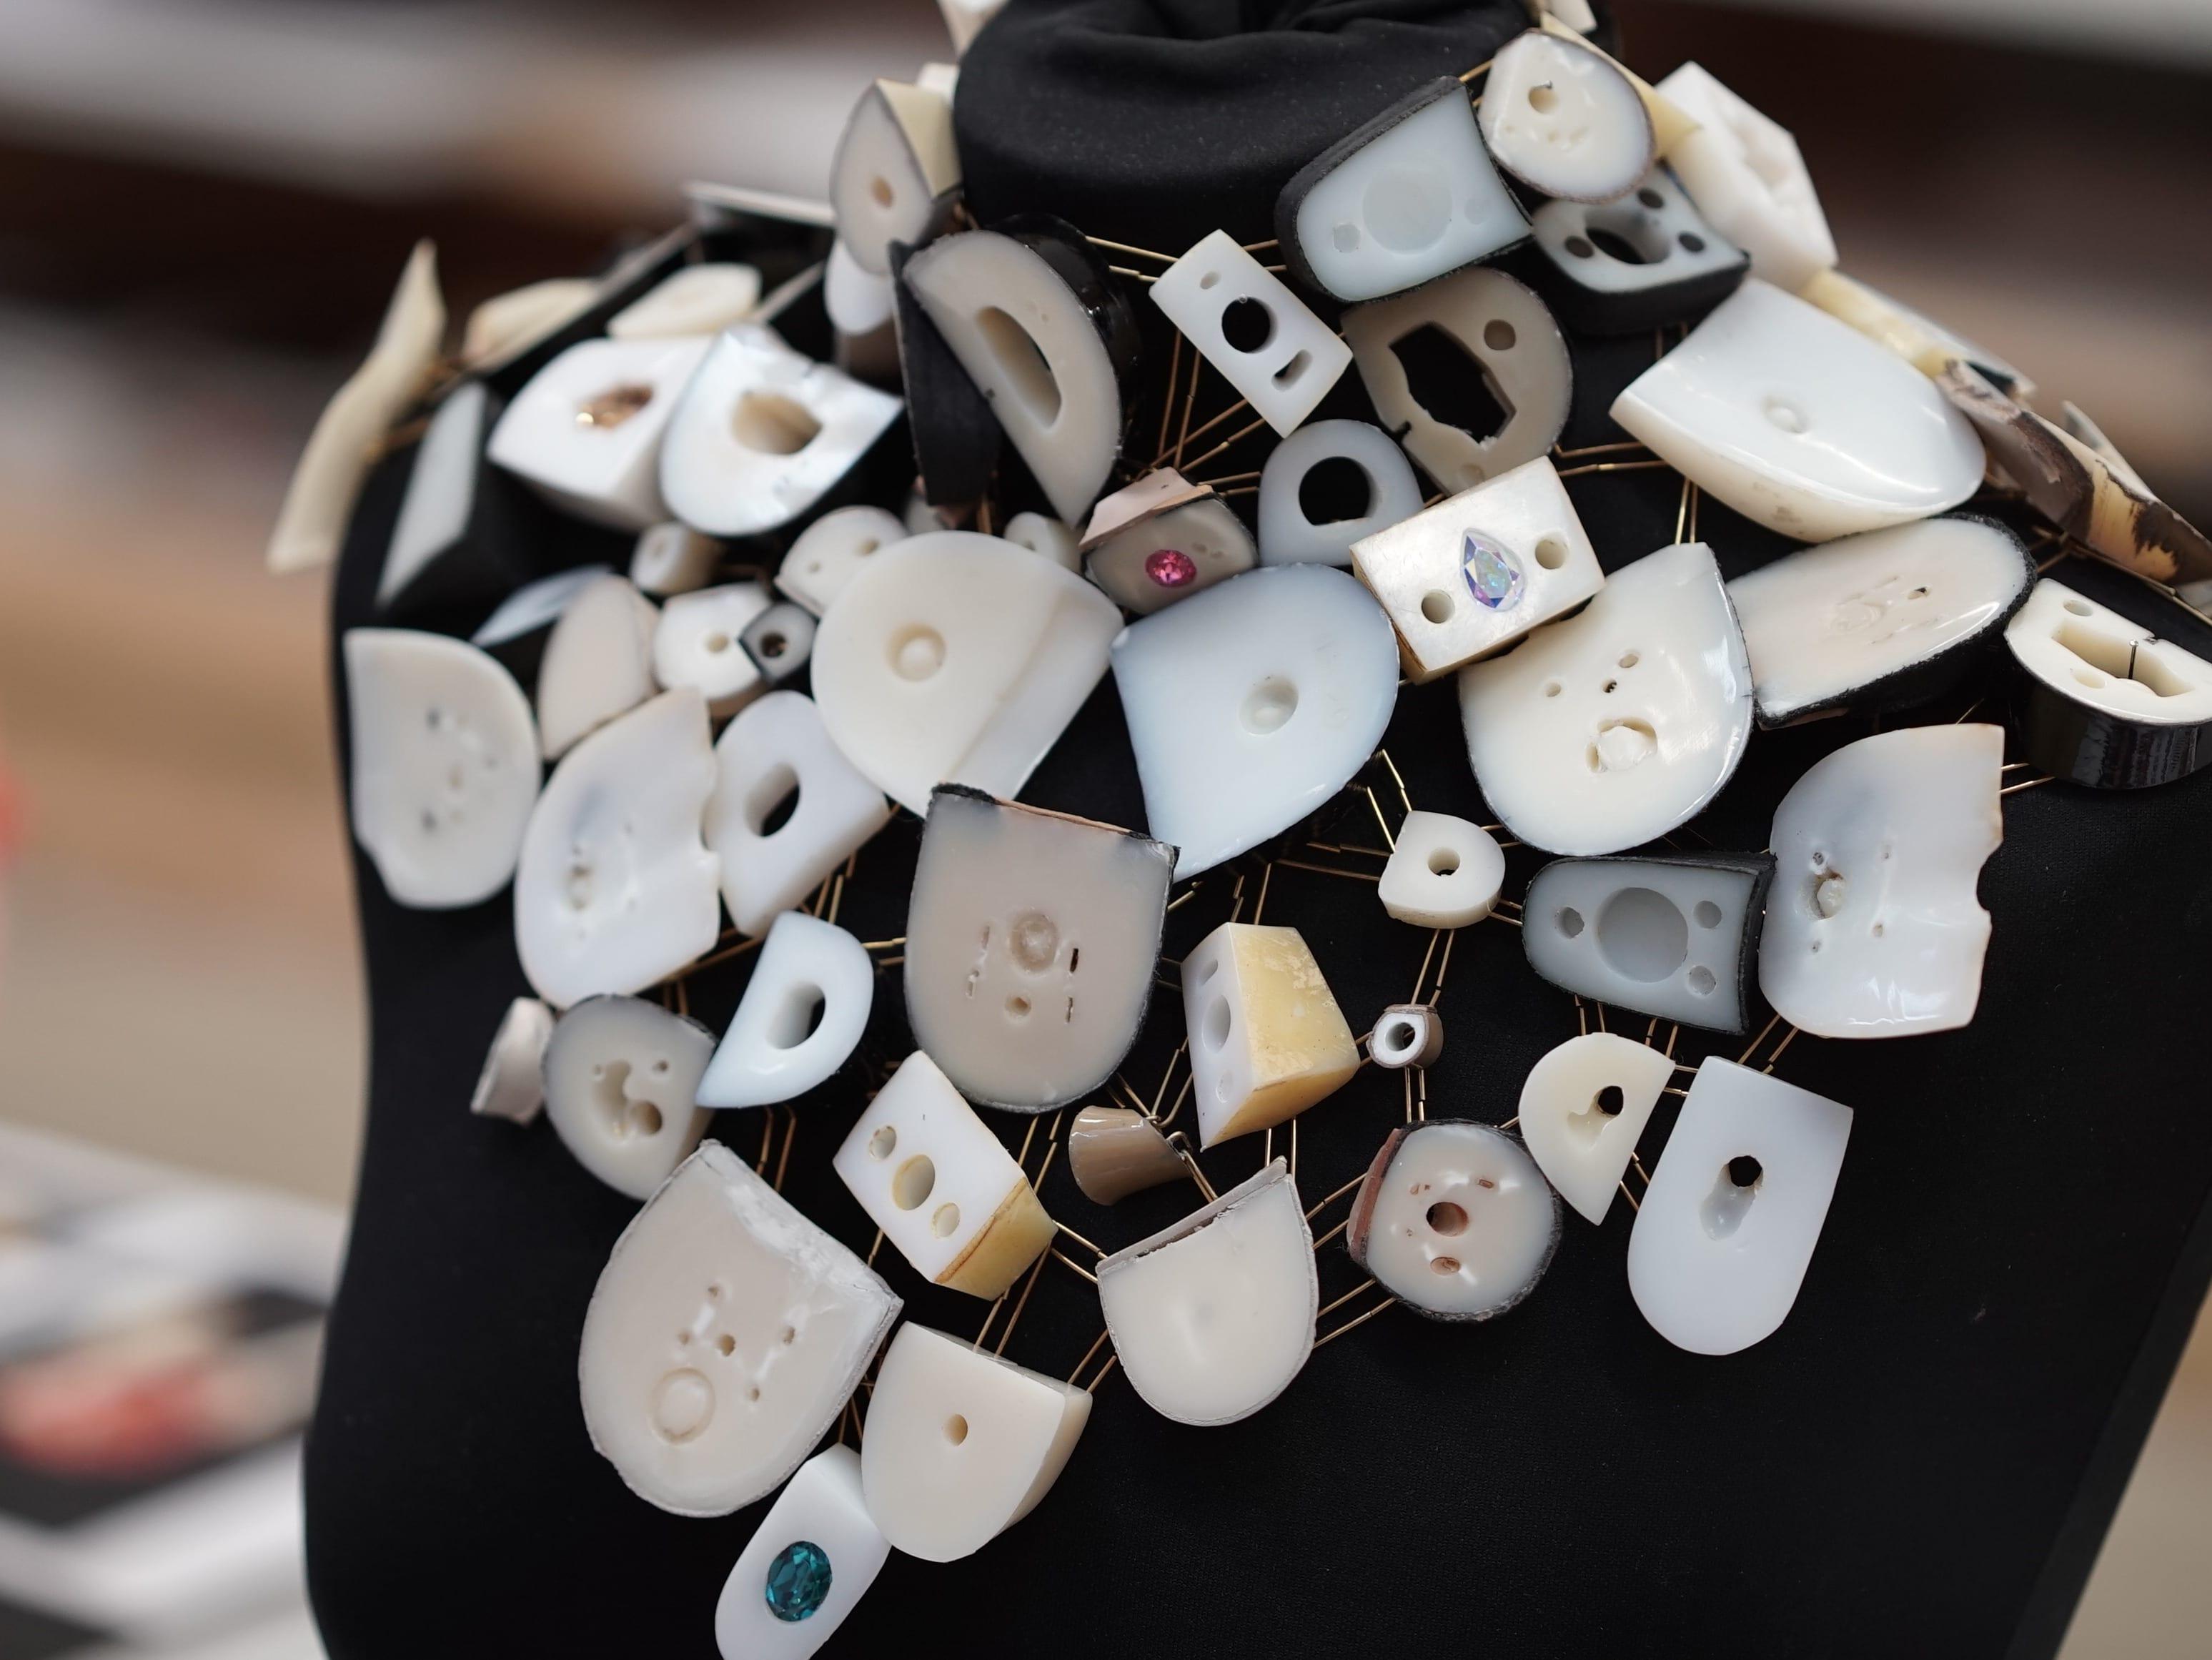 Necklace made of heels created for the 2019 Swarovski Sustainability project by Mizuki Tochigi